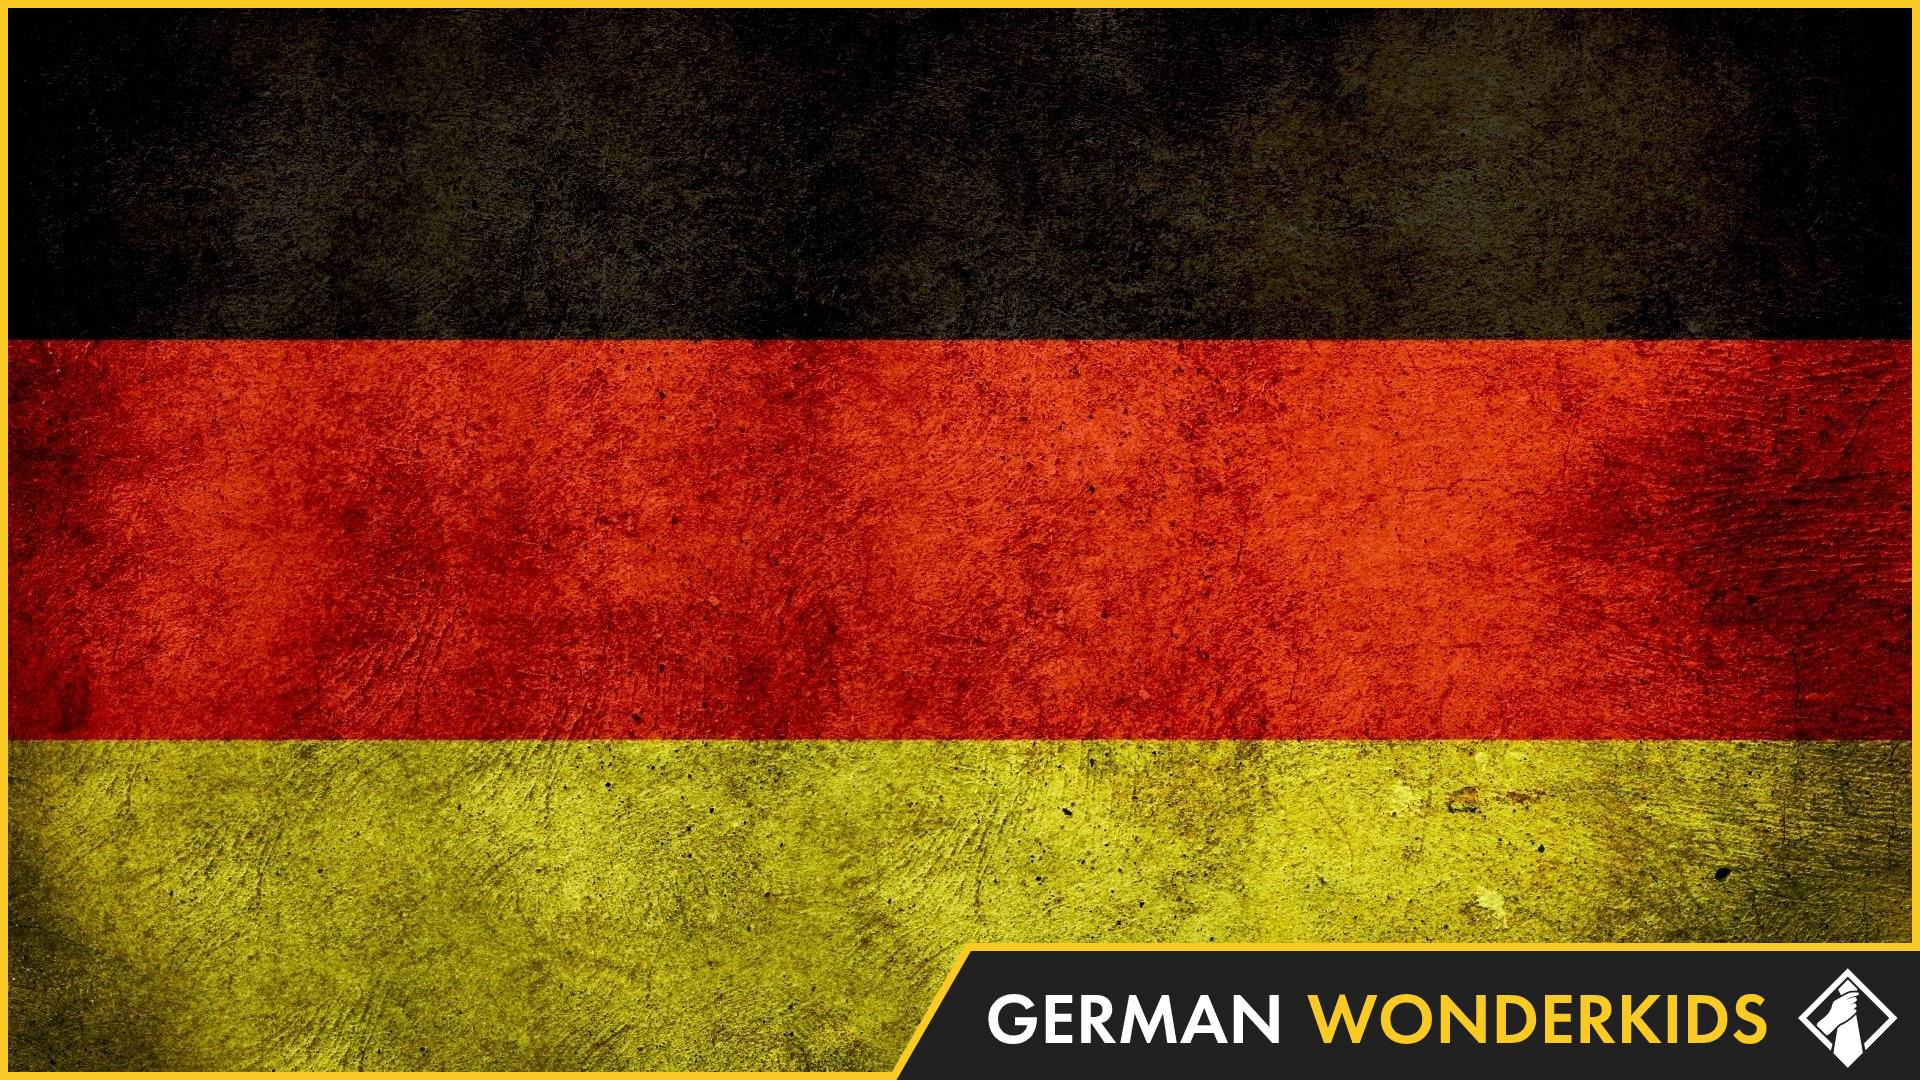 """FM21 German Wonderkids"" feature image"